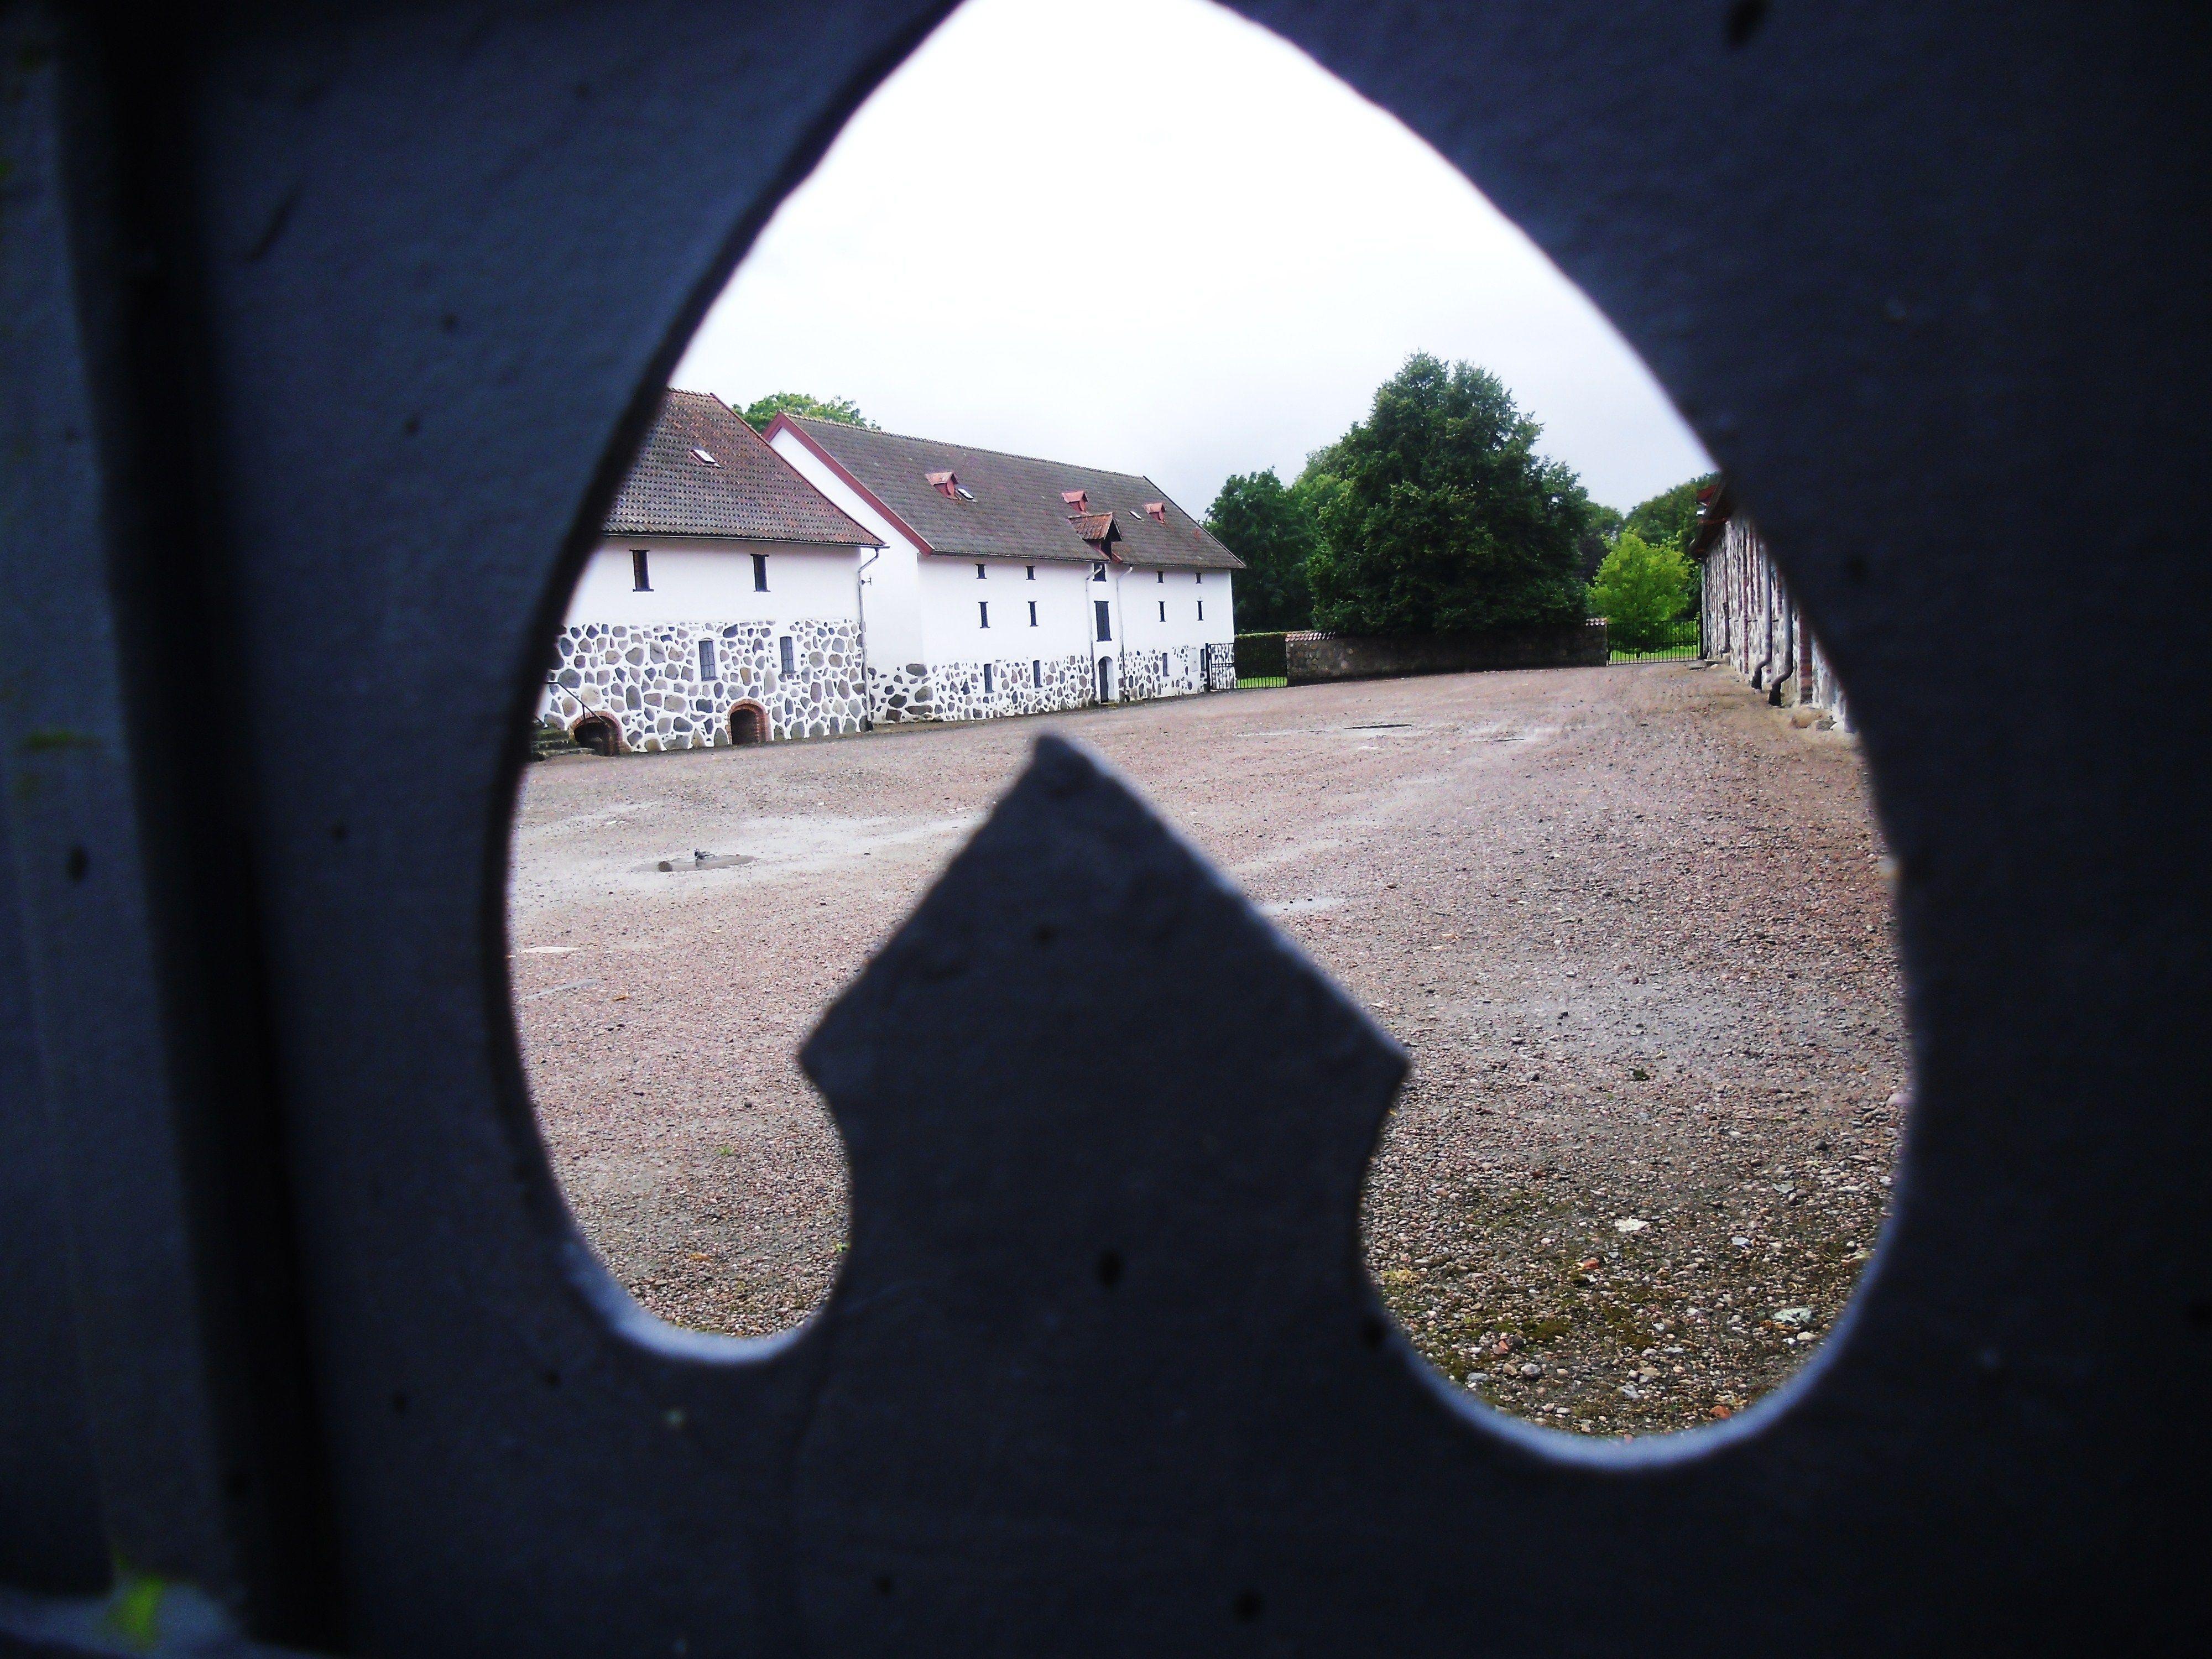 Through the ironwork gate, Trolleholm, Sweden